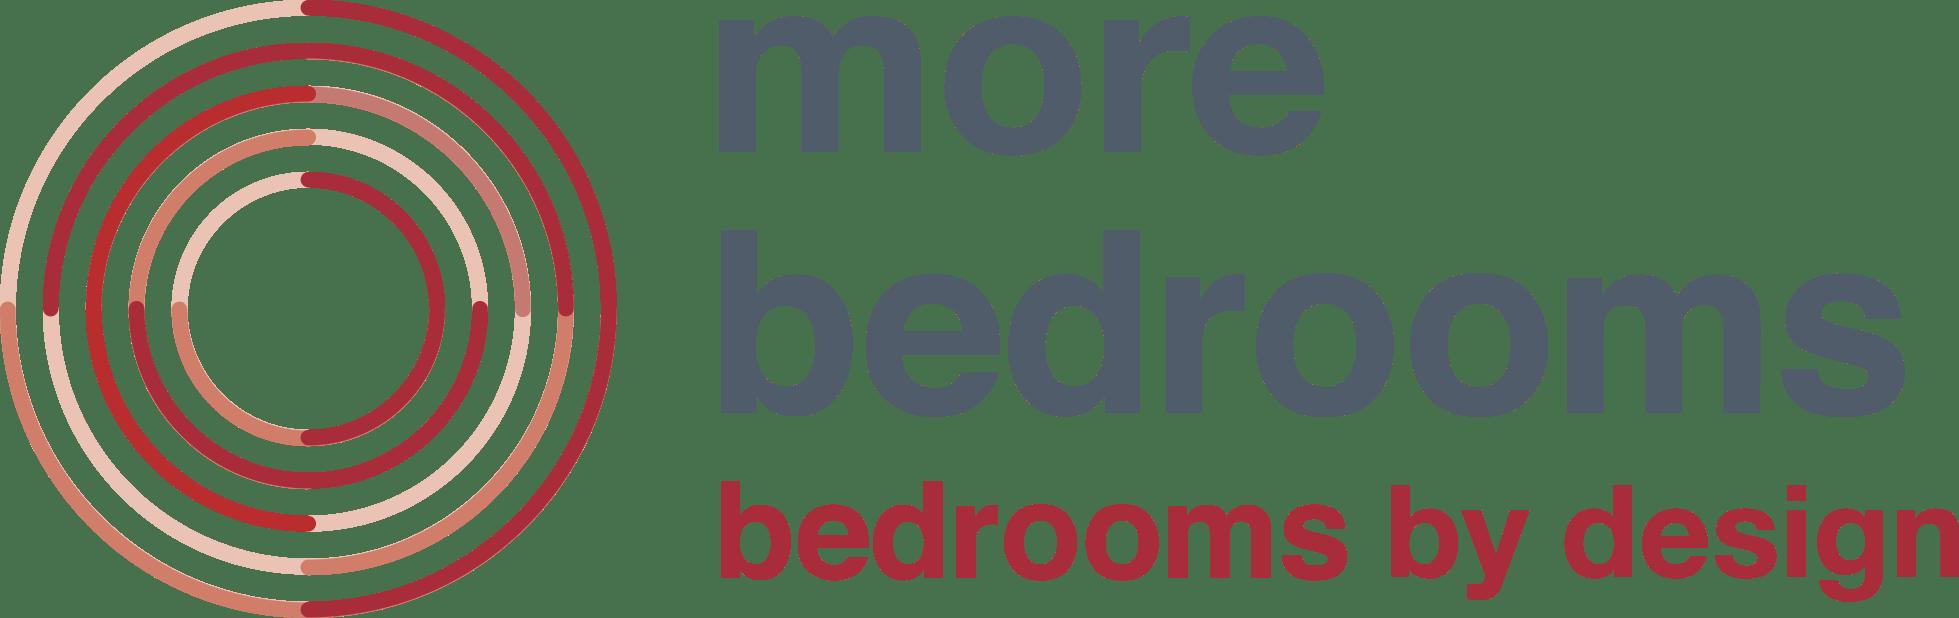 More Bedrooms Logo